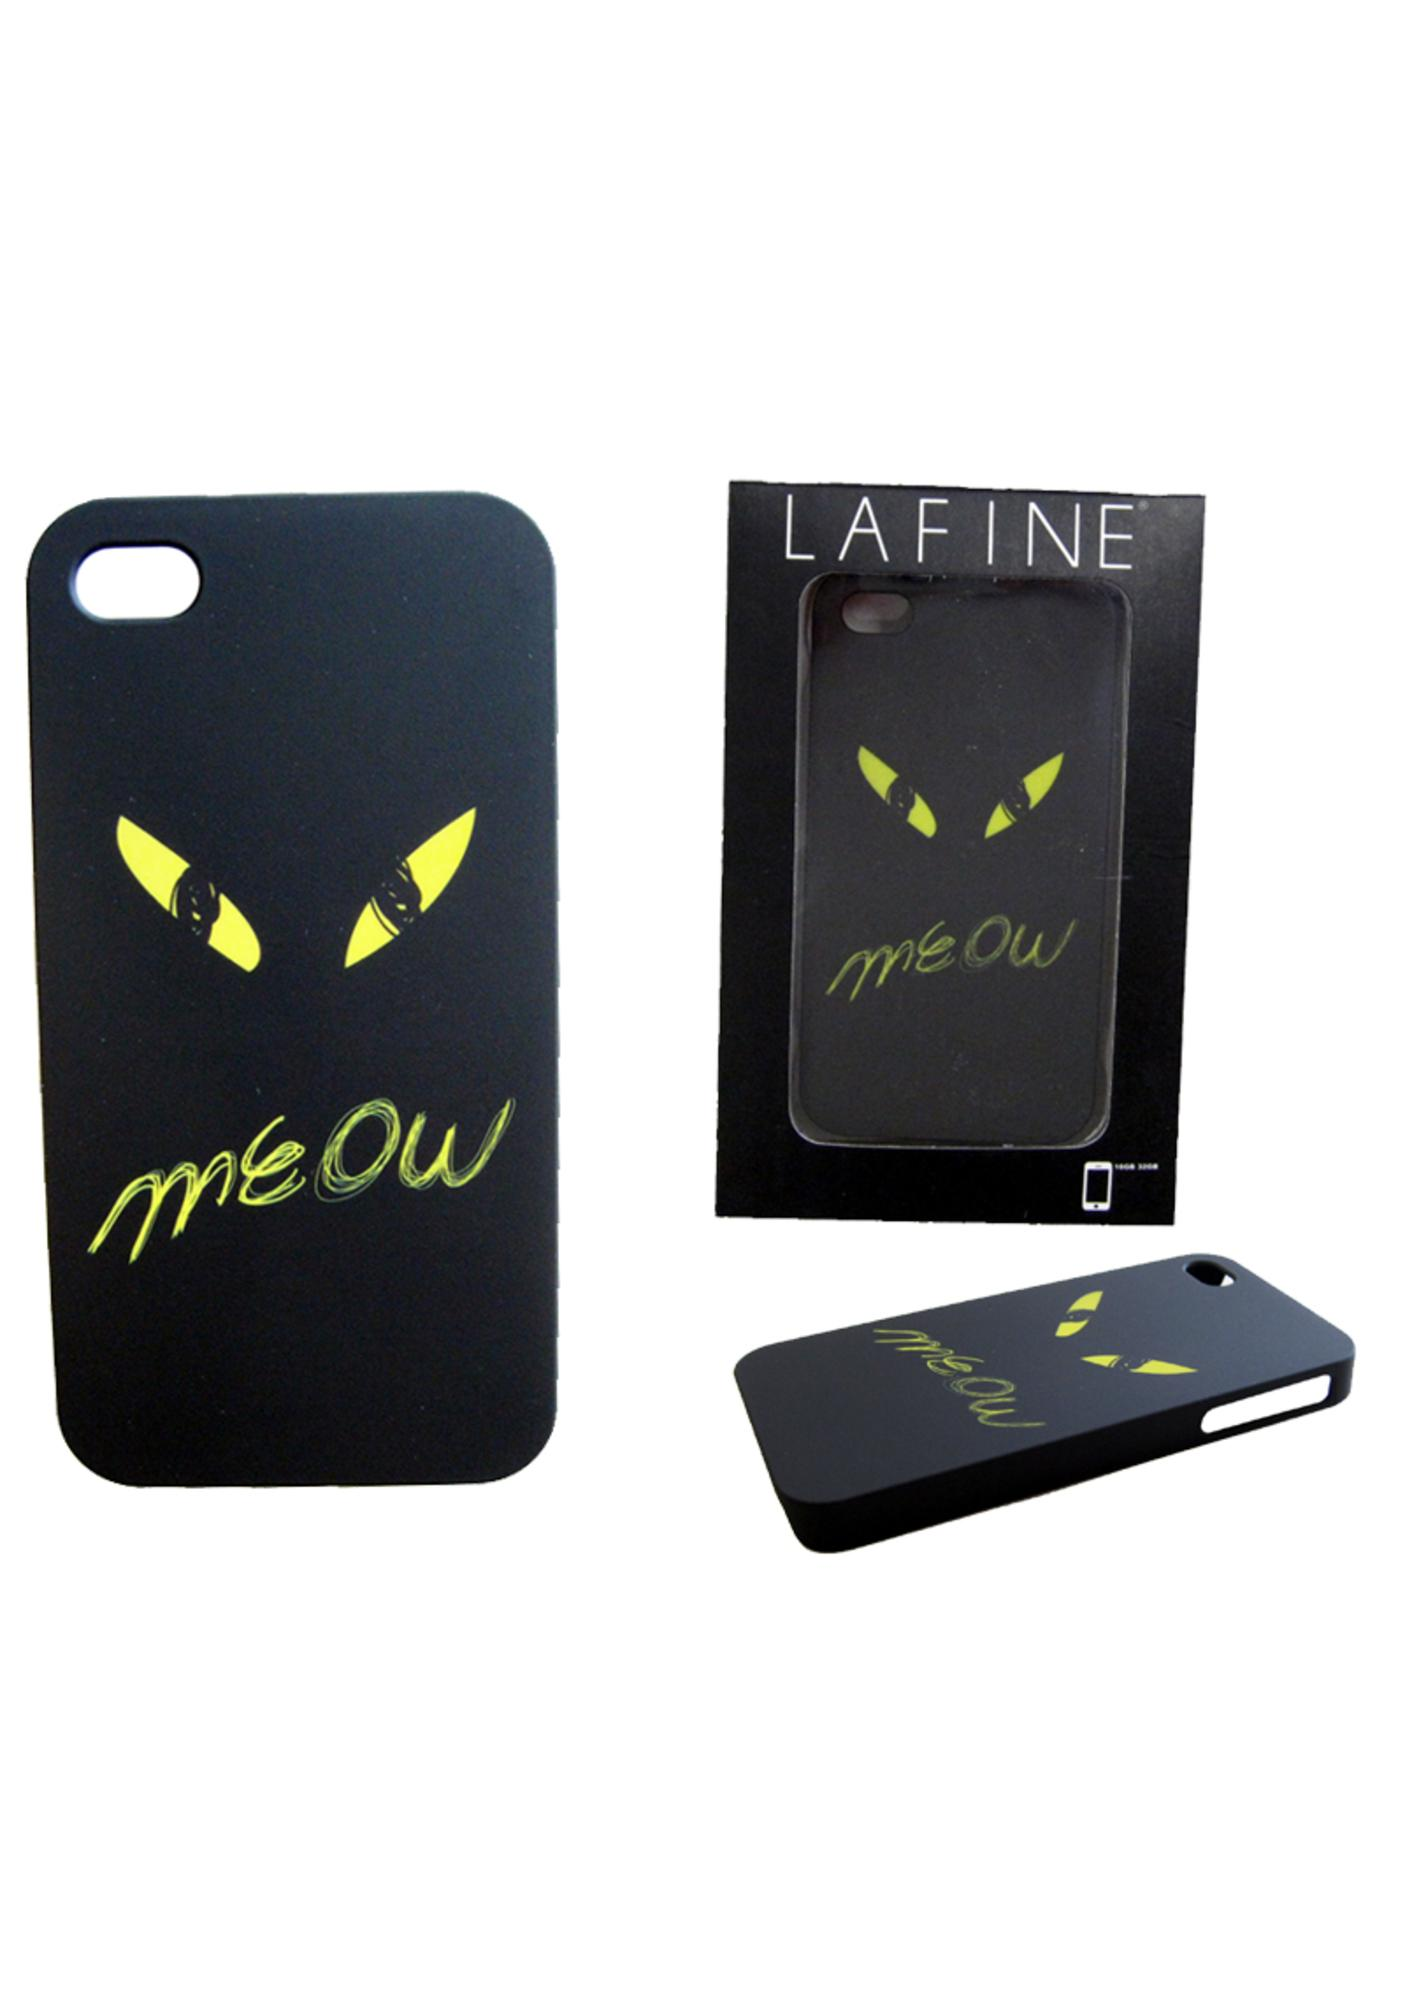 Lafine Meow iPhone Case